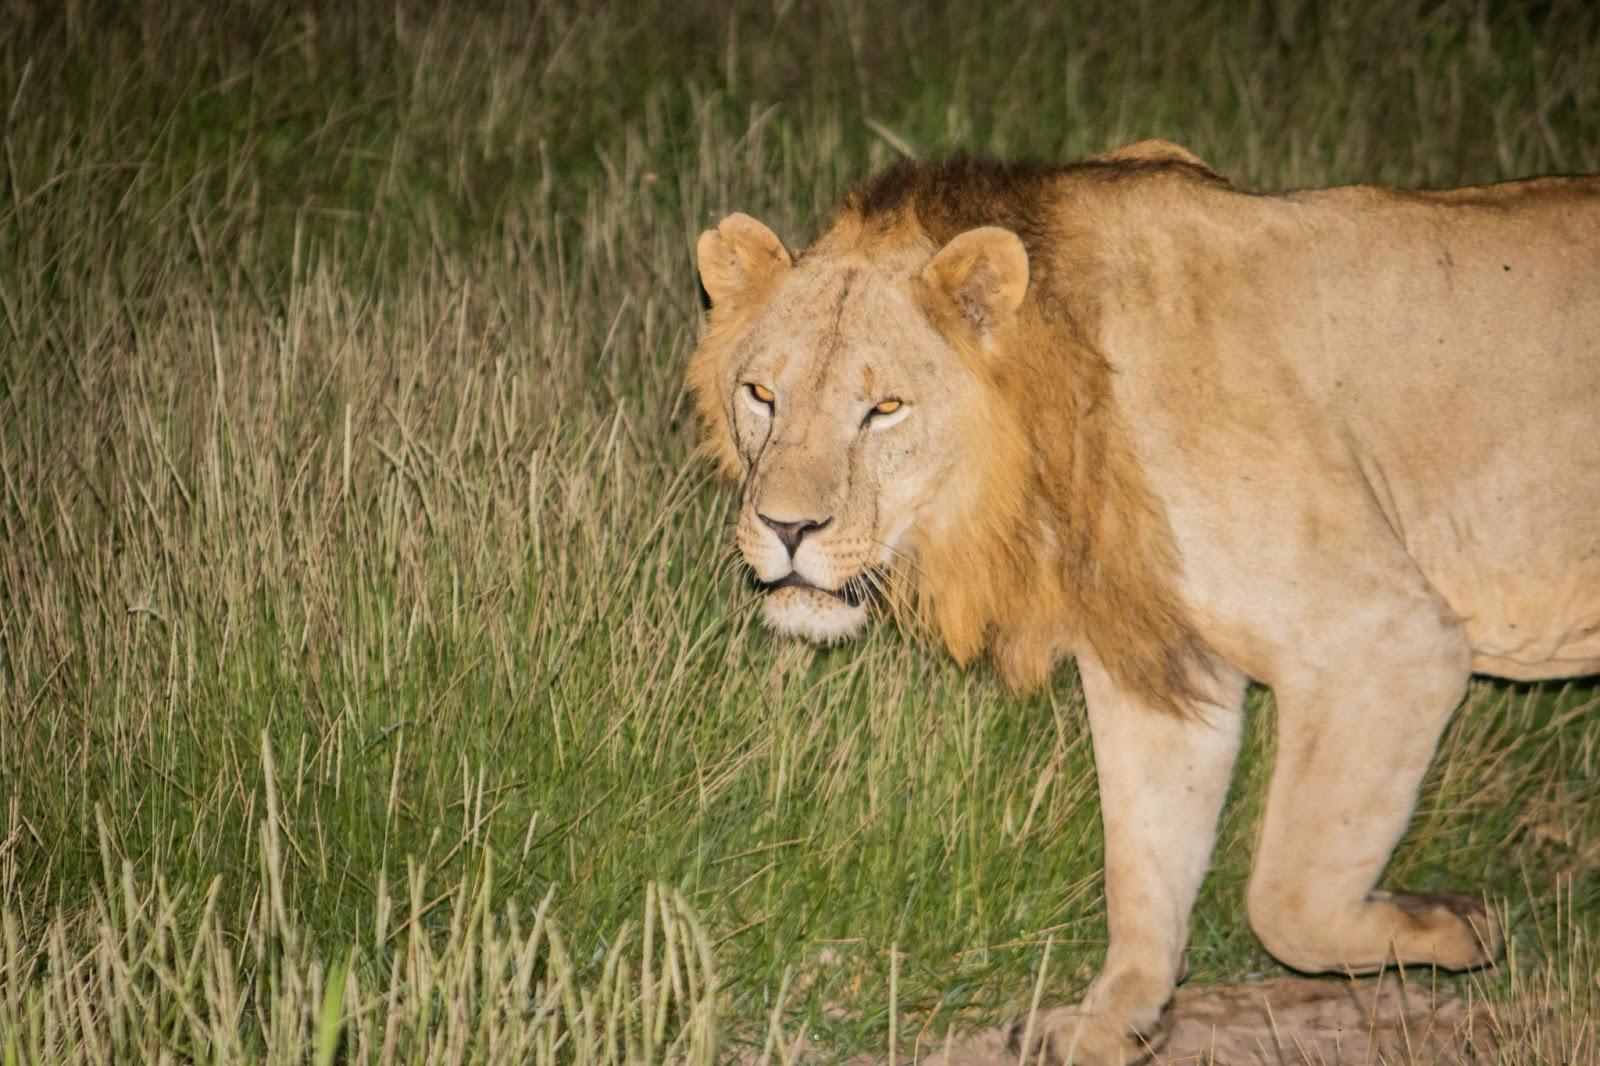 Male lion walking out of the bush - photo by Ryan Frederick Wiramidjaja